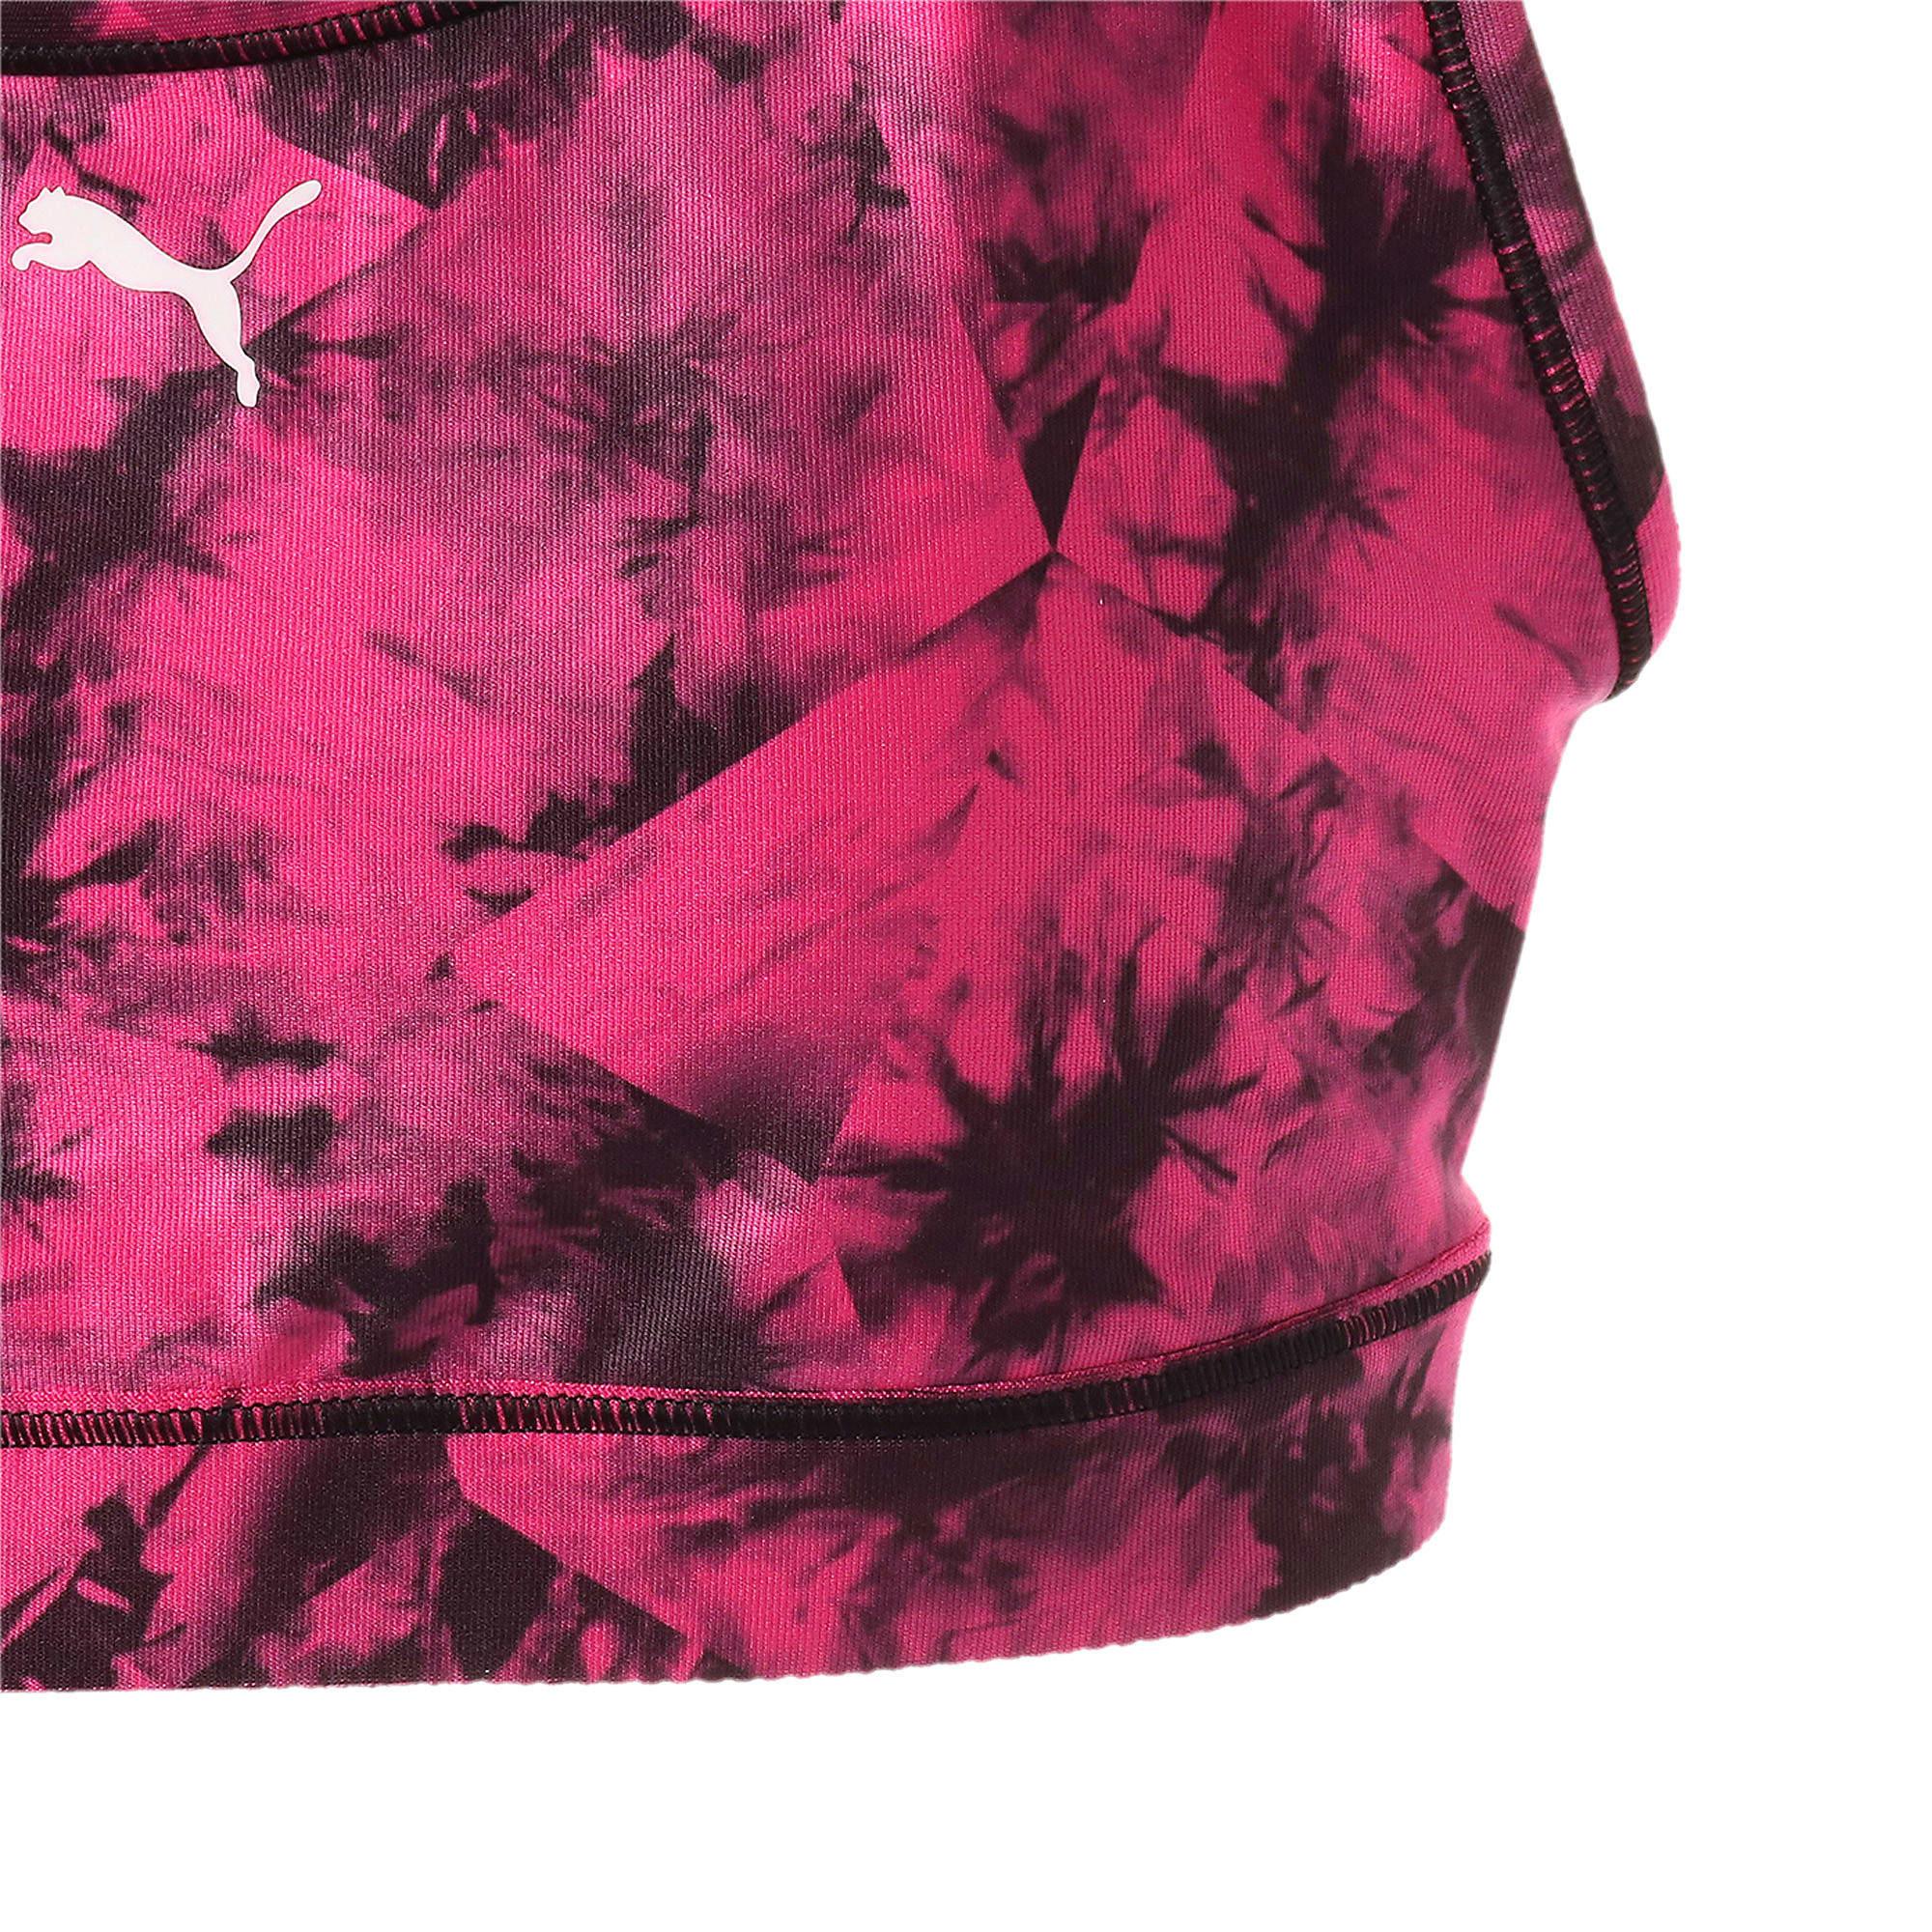 Thumbnail 6 of A.C.E. 4キープ グラフィック ウィメンズ ブラトップ ミディアムサポート, fuchsia purple-puma black, medium-JPN